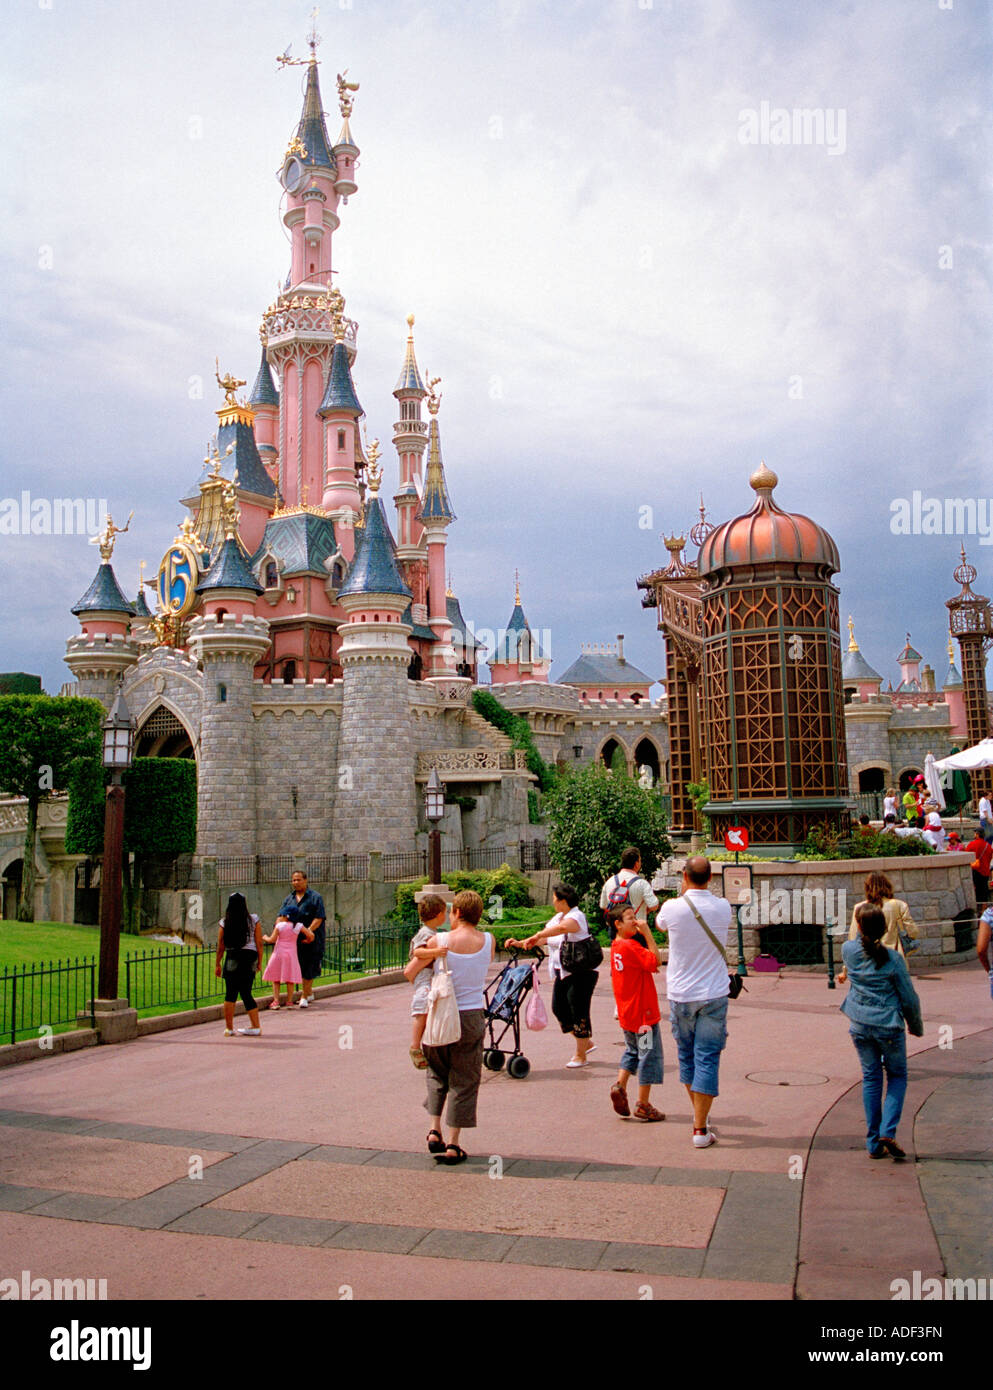 Fairytale castle in fantasy land disneyland, Paris, France, Europe. - Stock Image